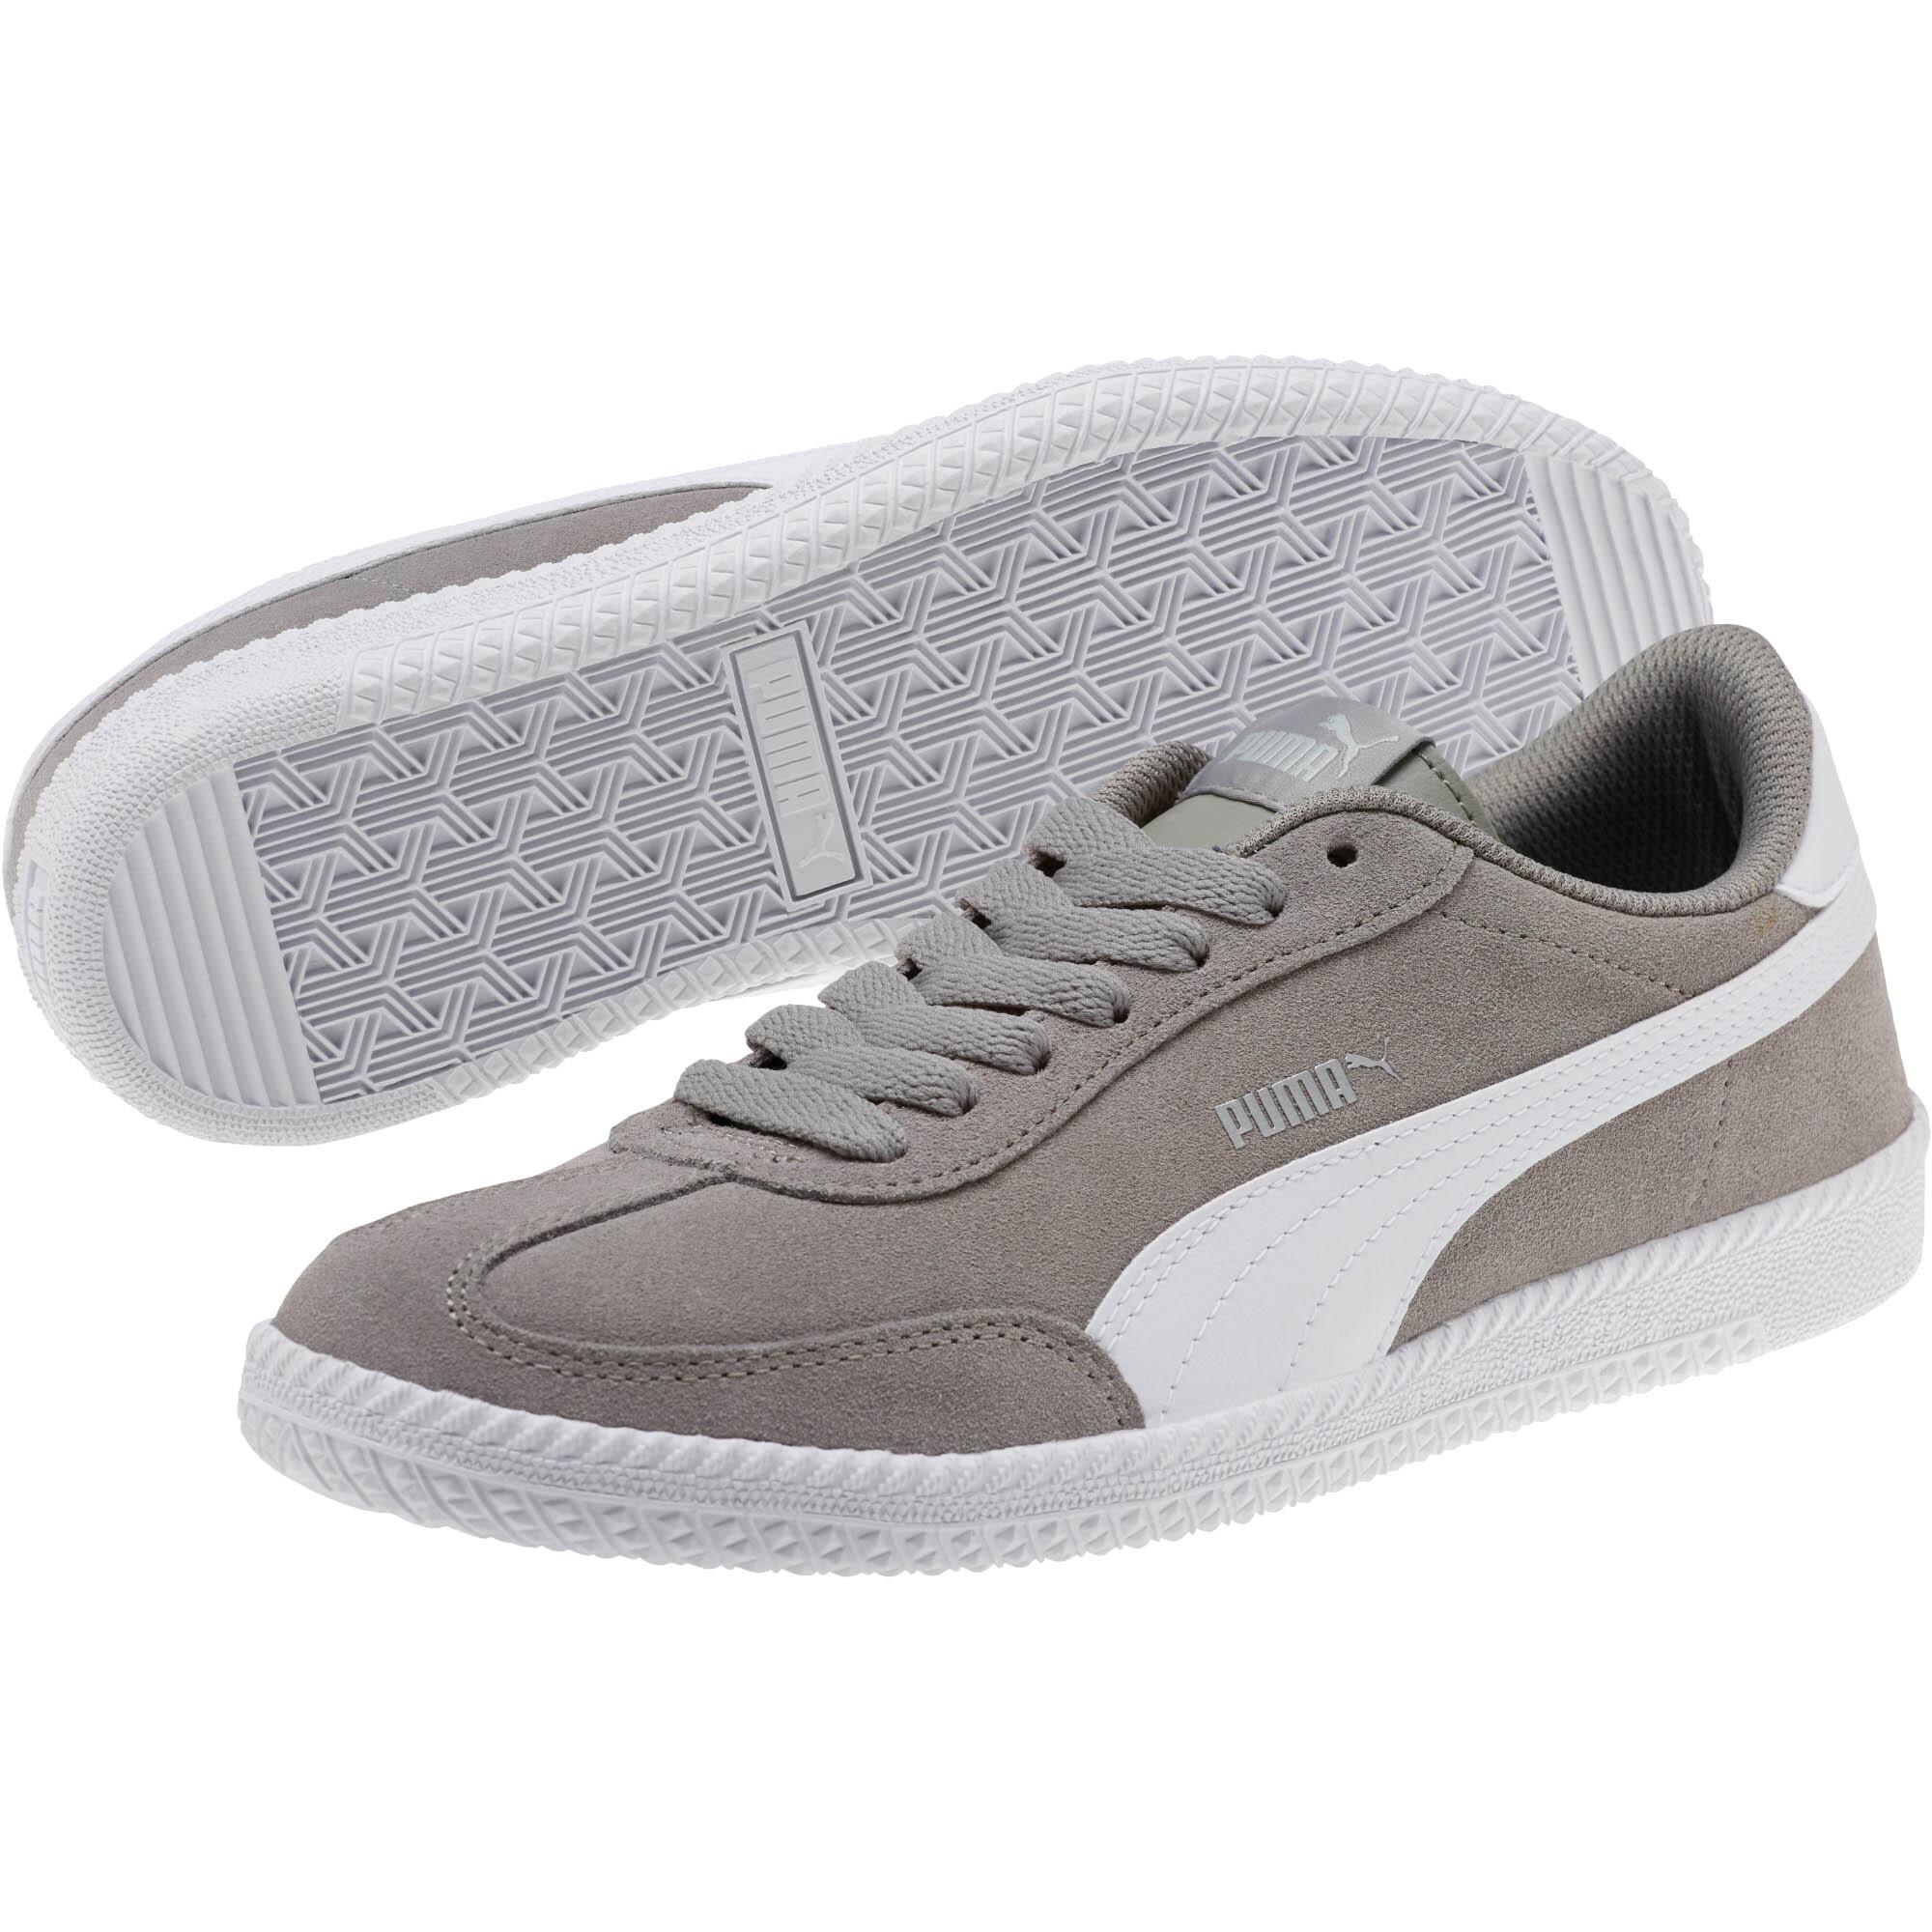 PUMA-Astro-Cup-Suede-Sneakers-Men-Shoe-Basics thumbnail 17